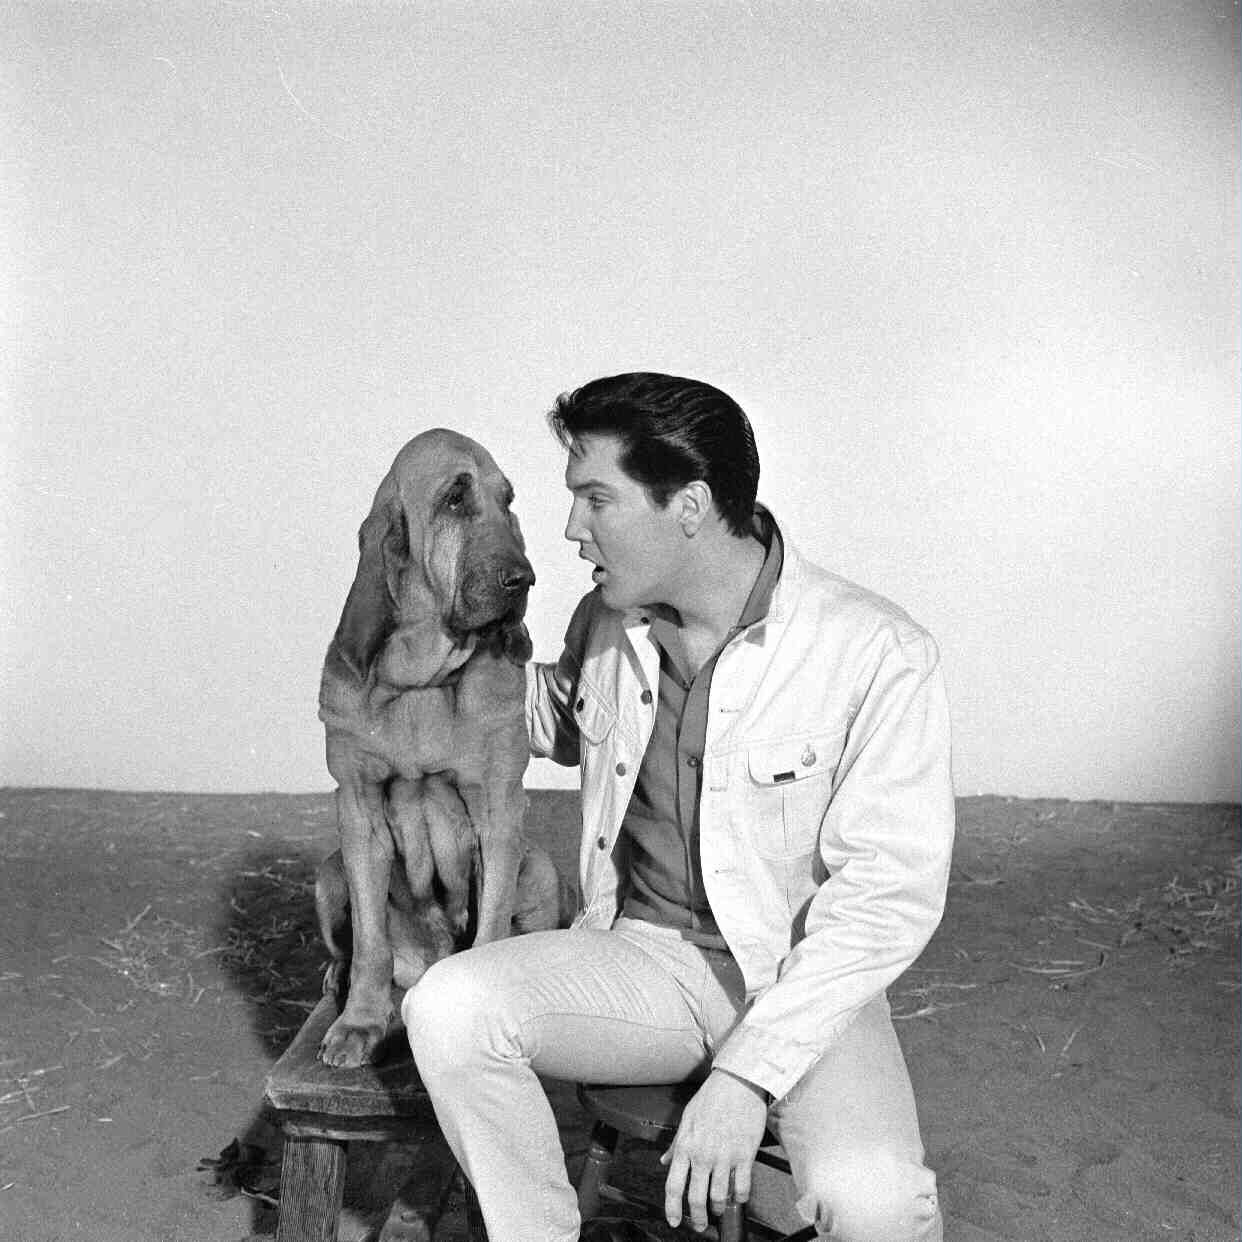 Kissin' Cousins (1964). Publicity shot of Elvis Presley as